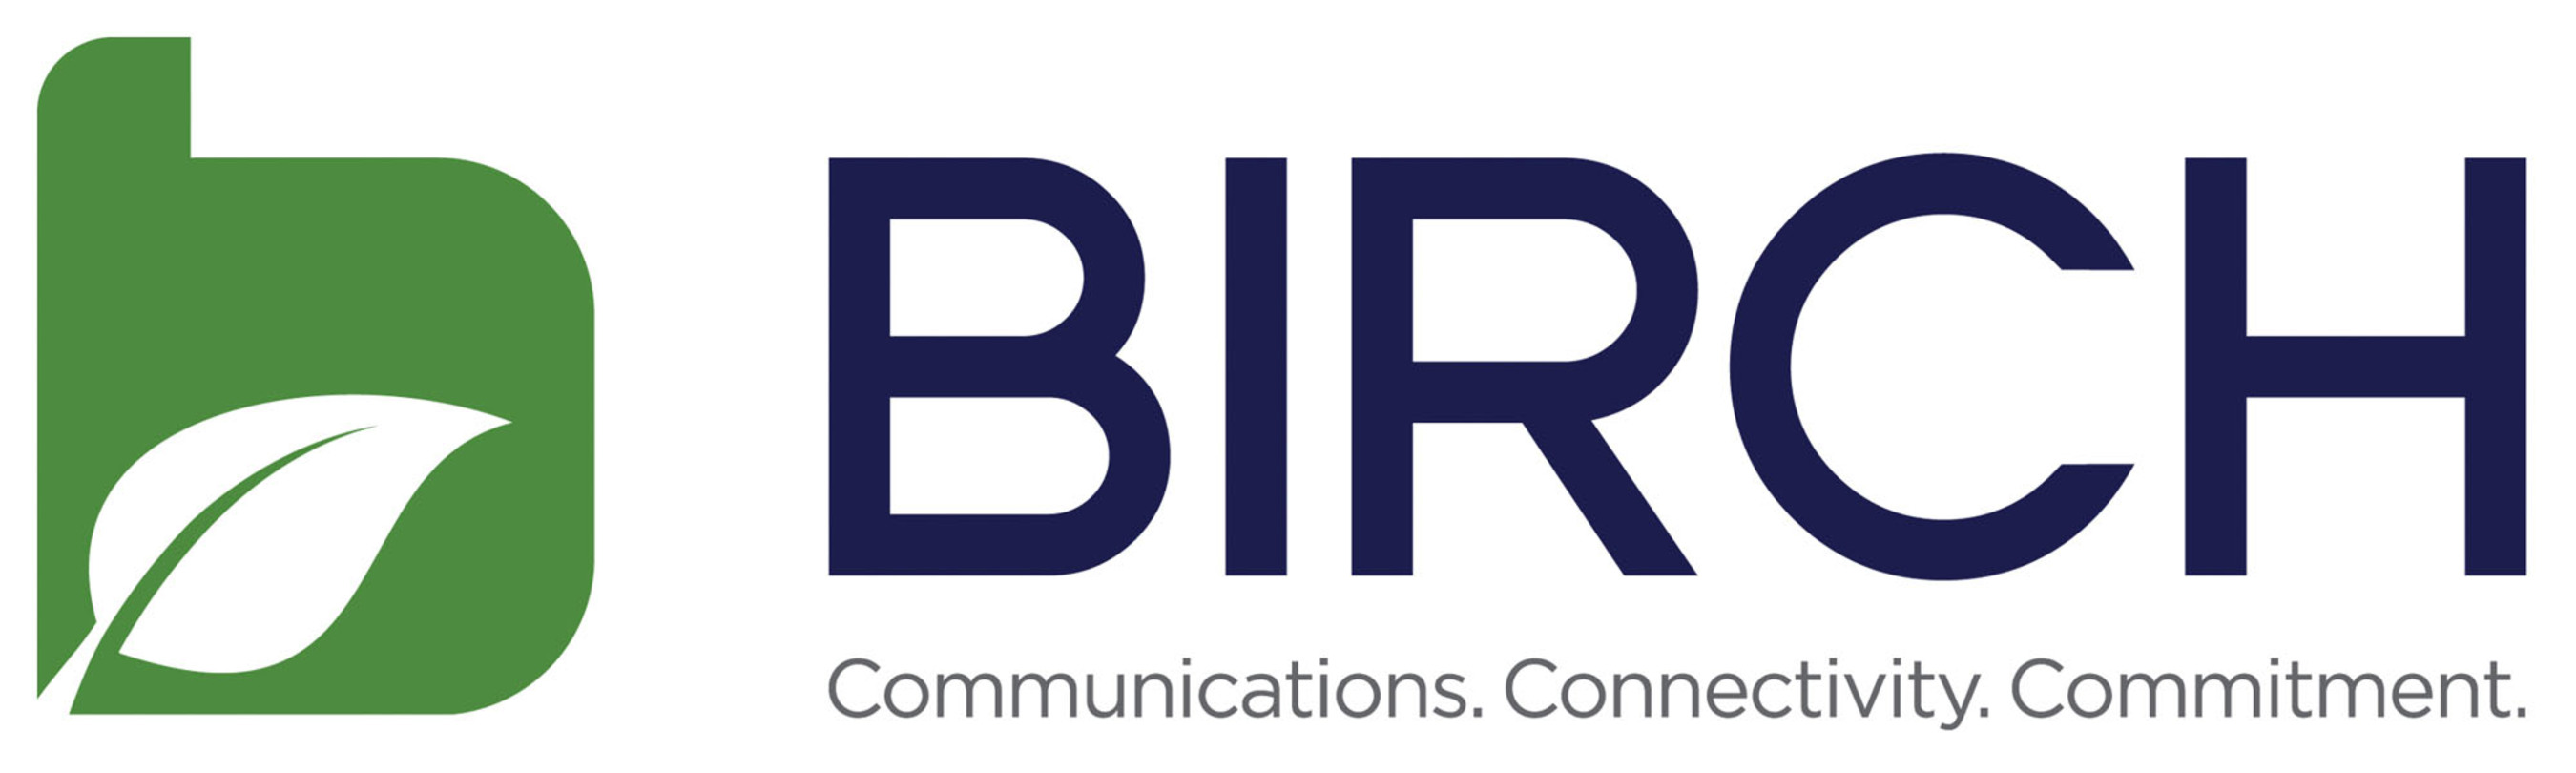 Birch Communications.